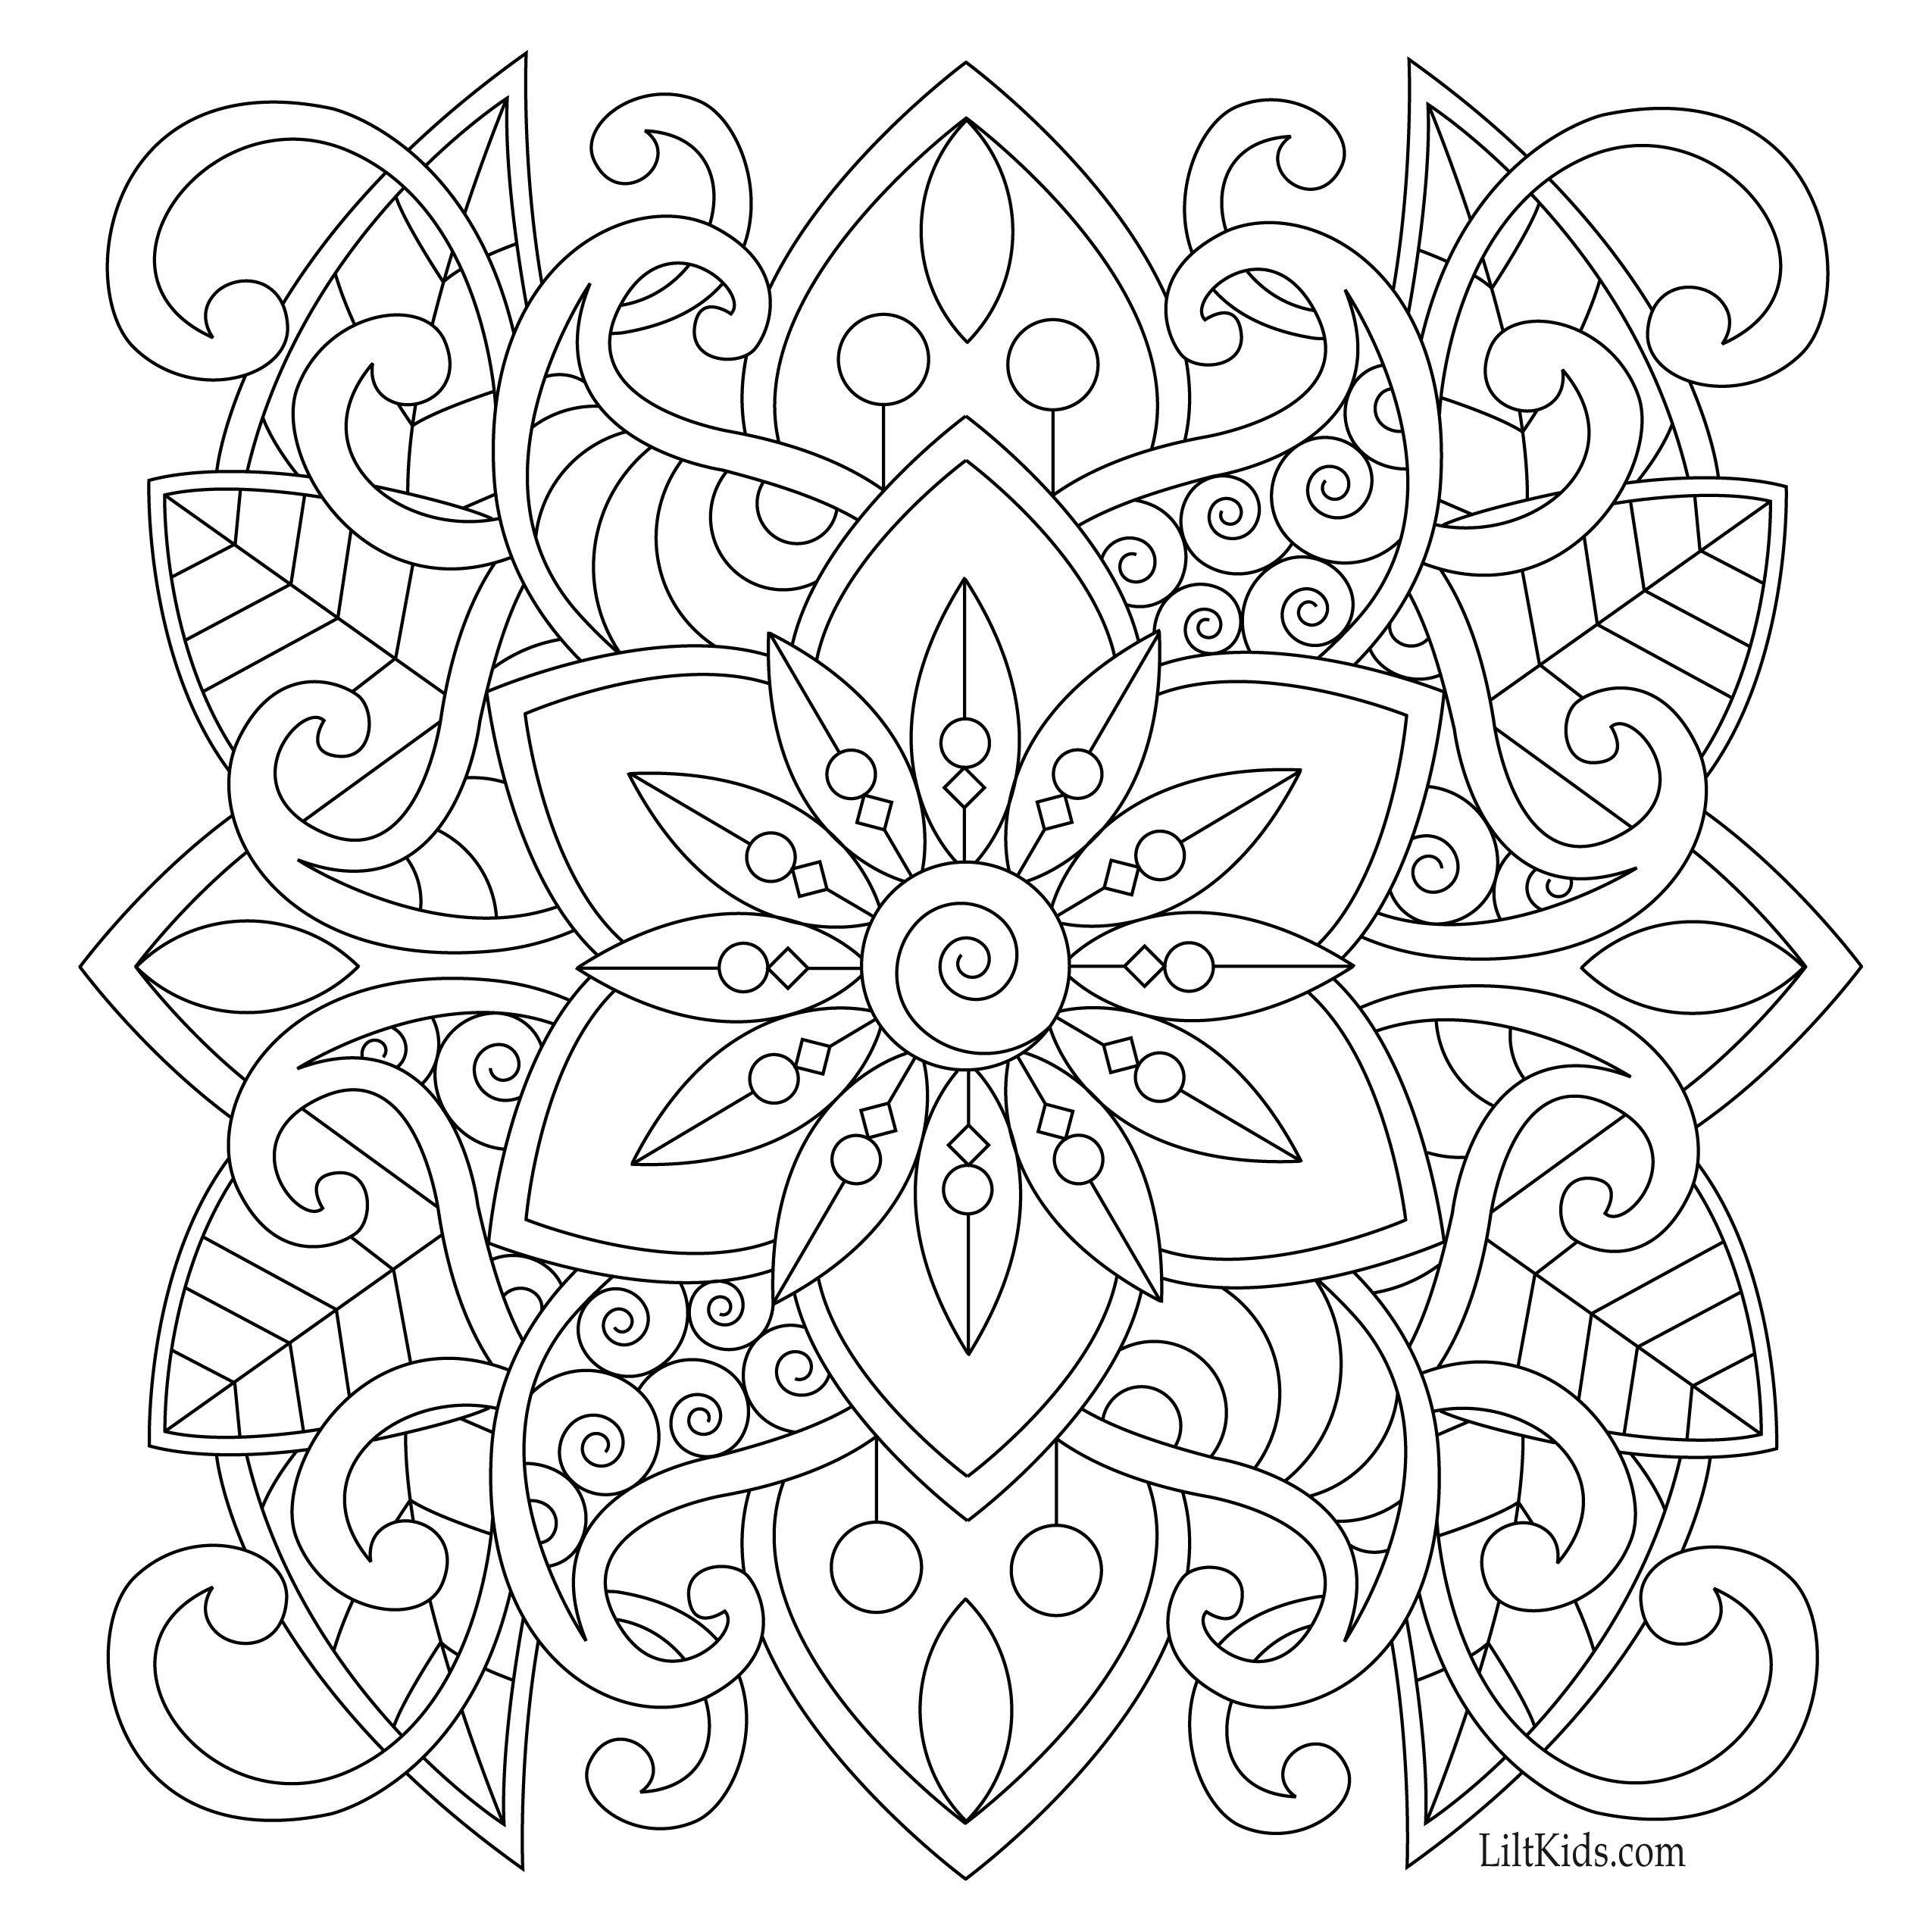 Free Easy Mandala For Beginners Adult Coloring Book Image